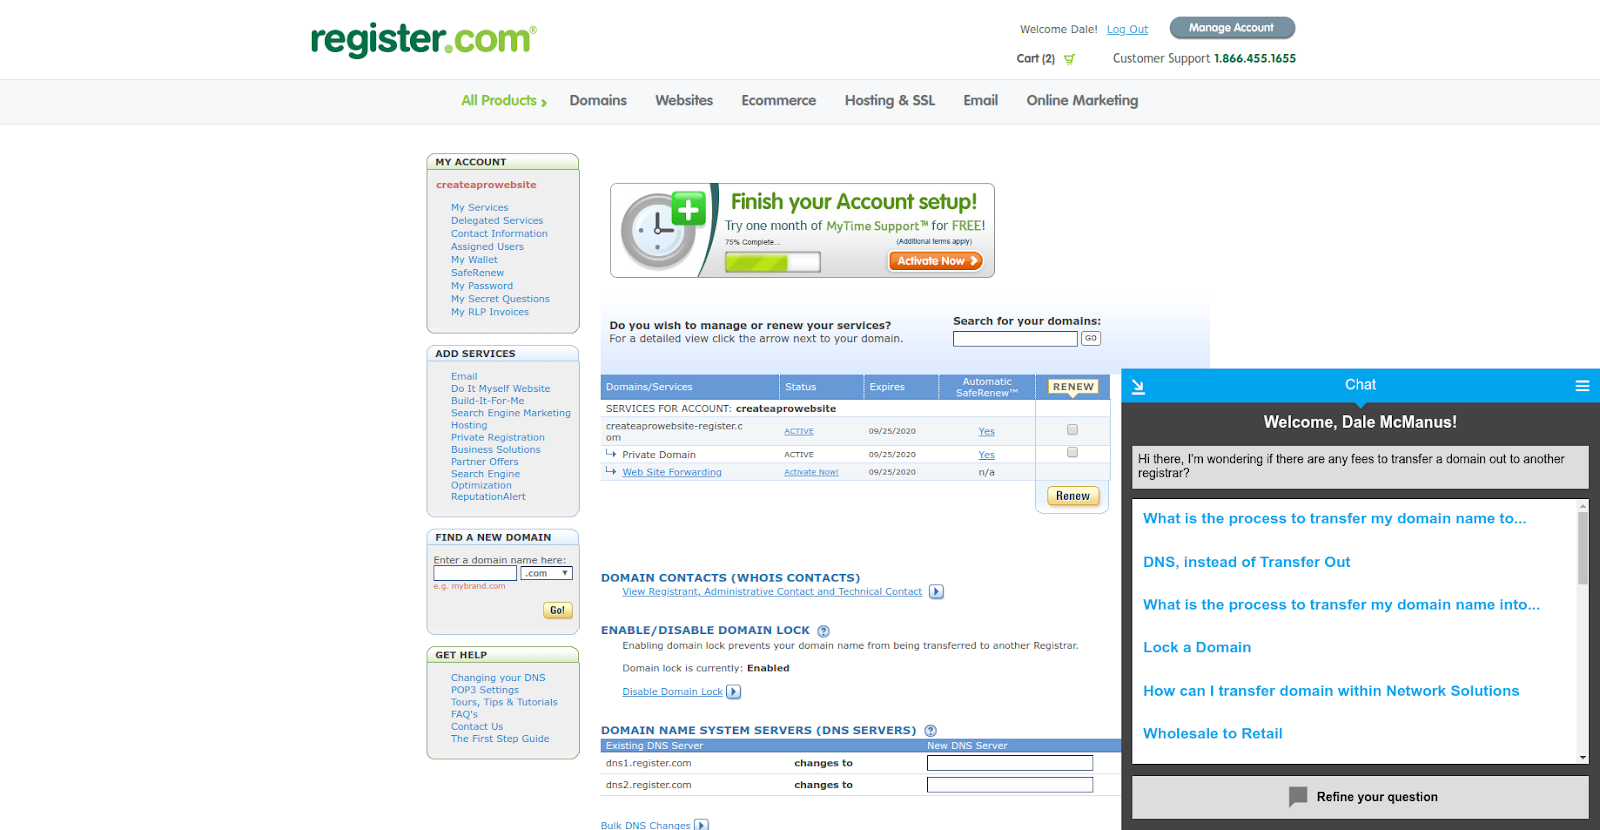 register.com domain support